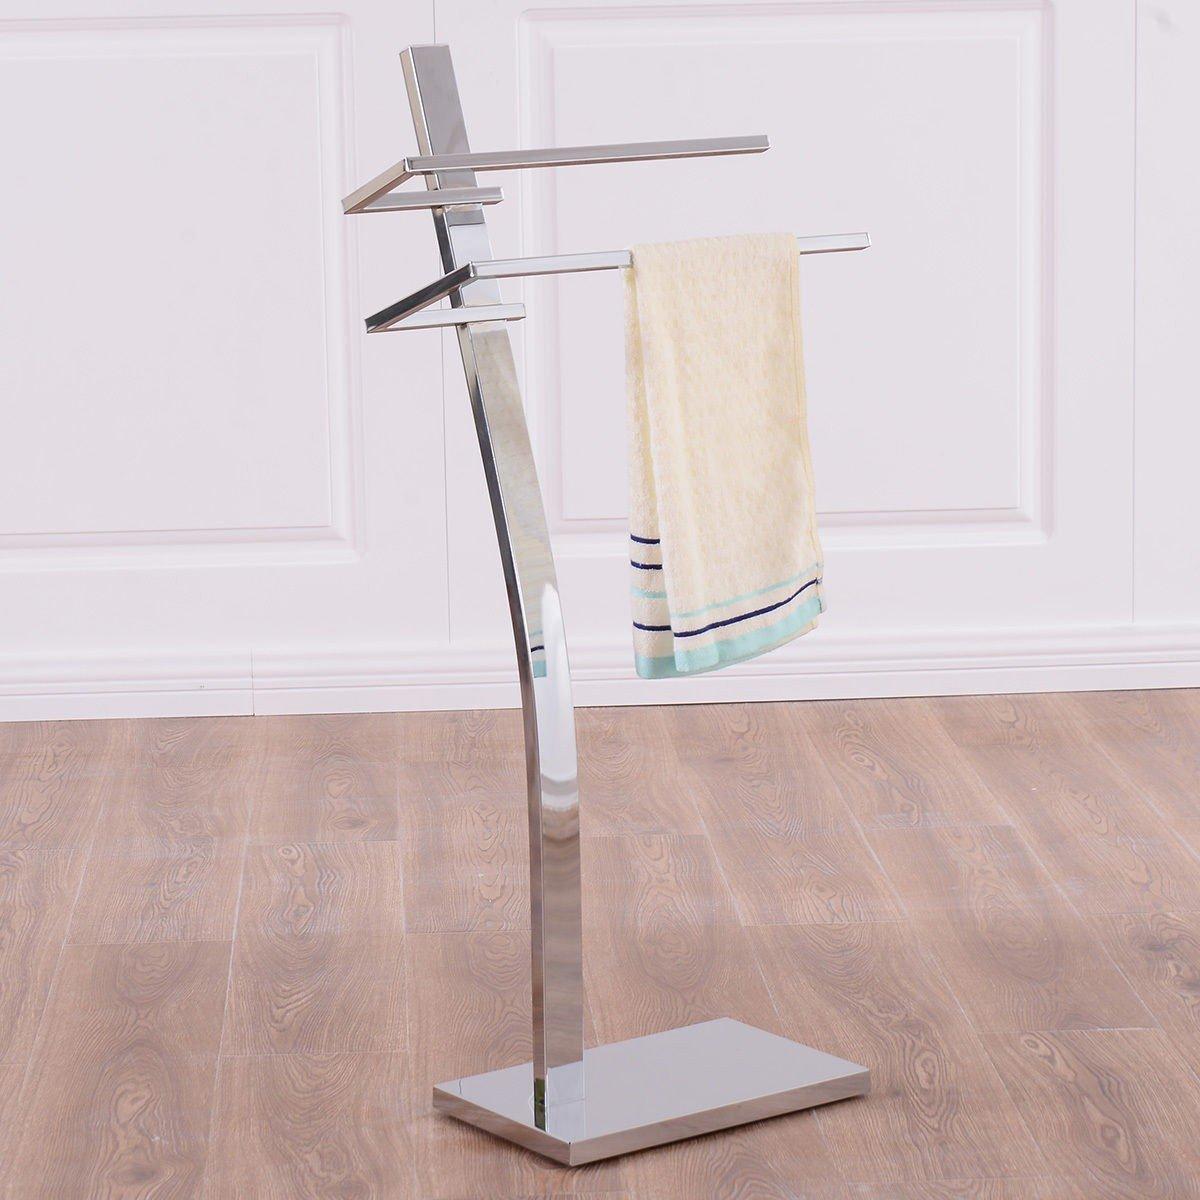 2-tier Free Standing床タオルホルダー – by Choice製品 B0751CXK6H